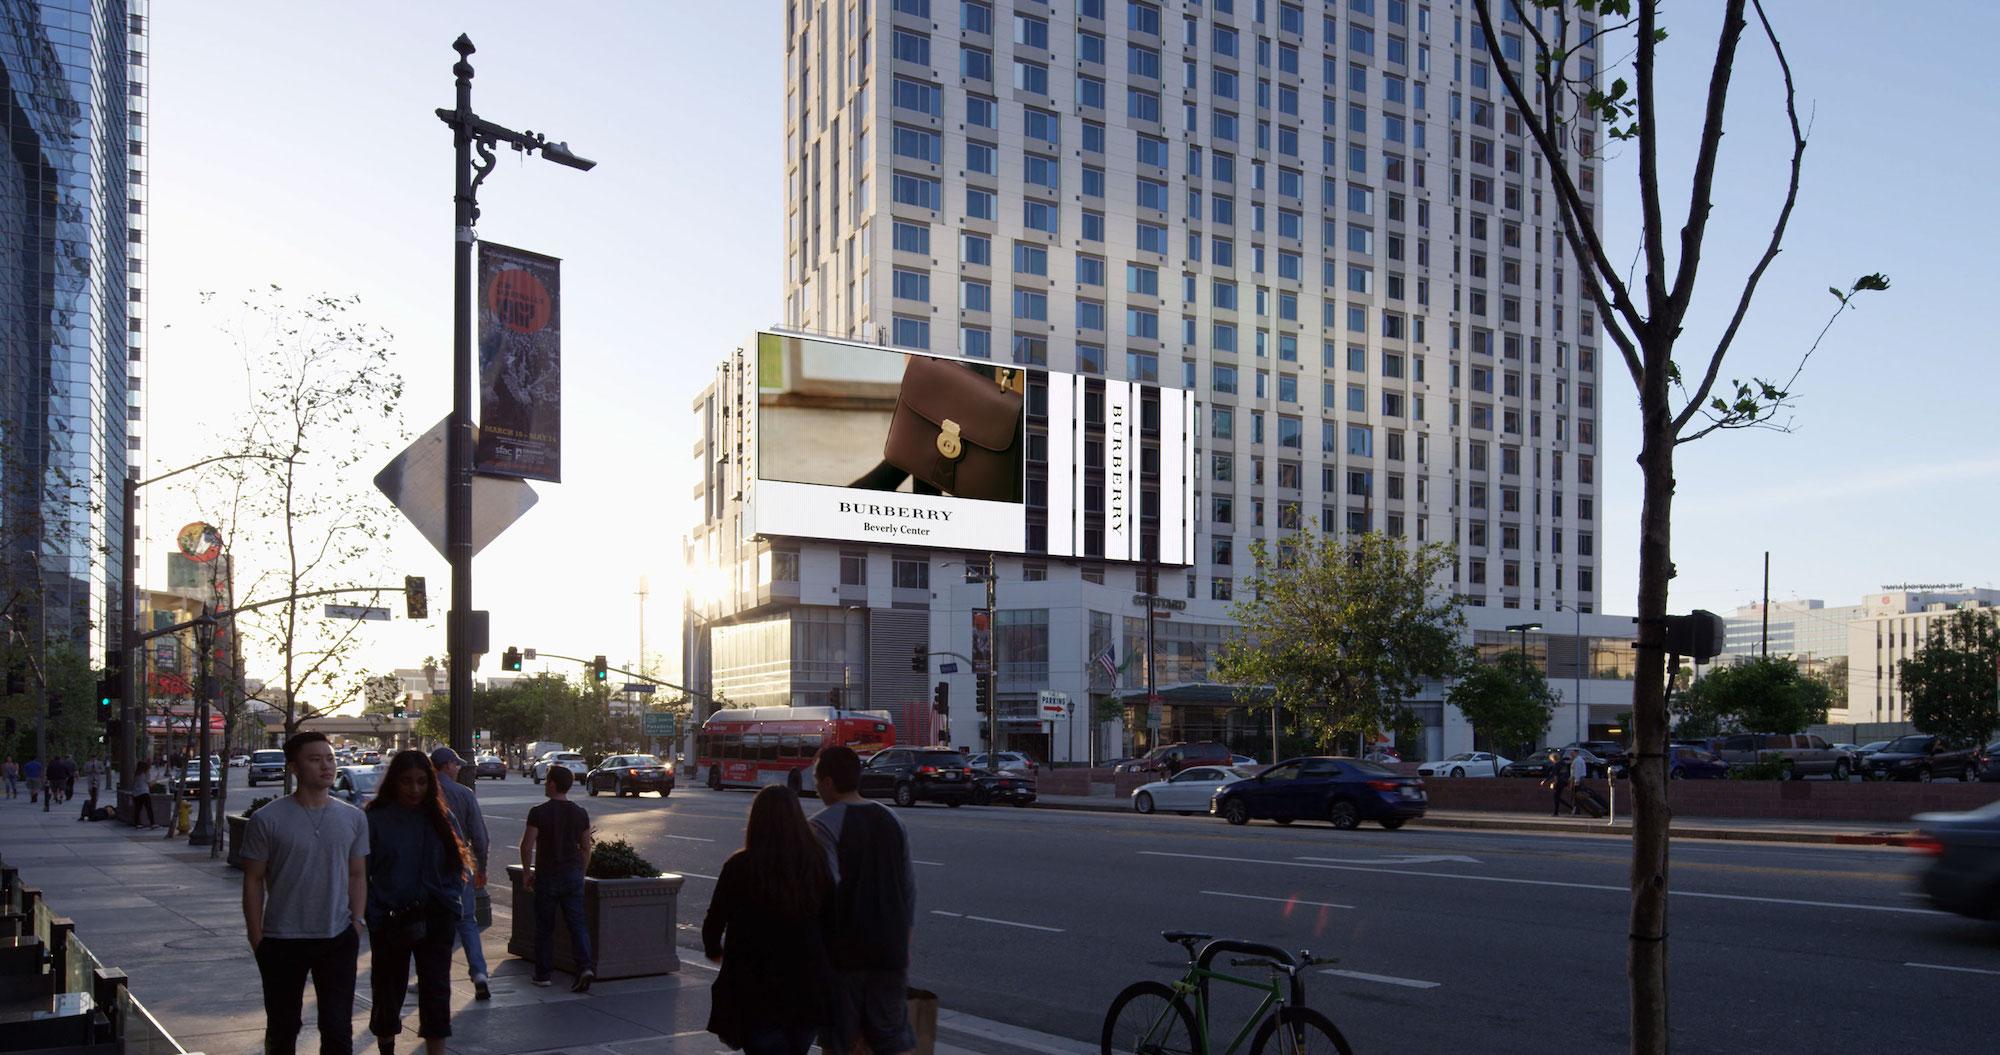 Marriott_ads_02.jpg